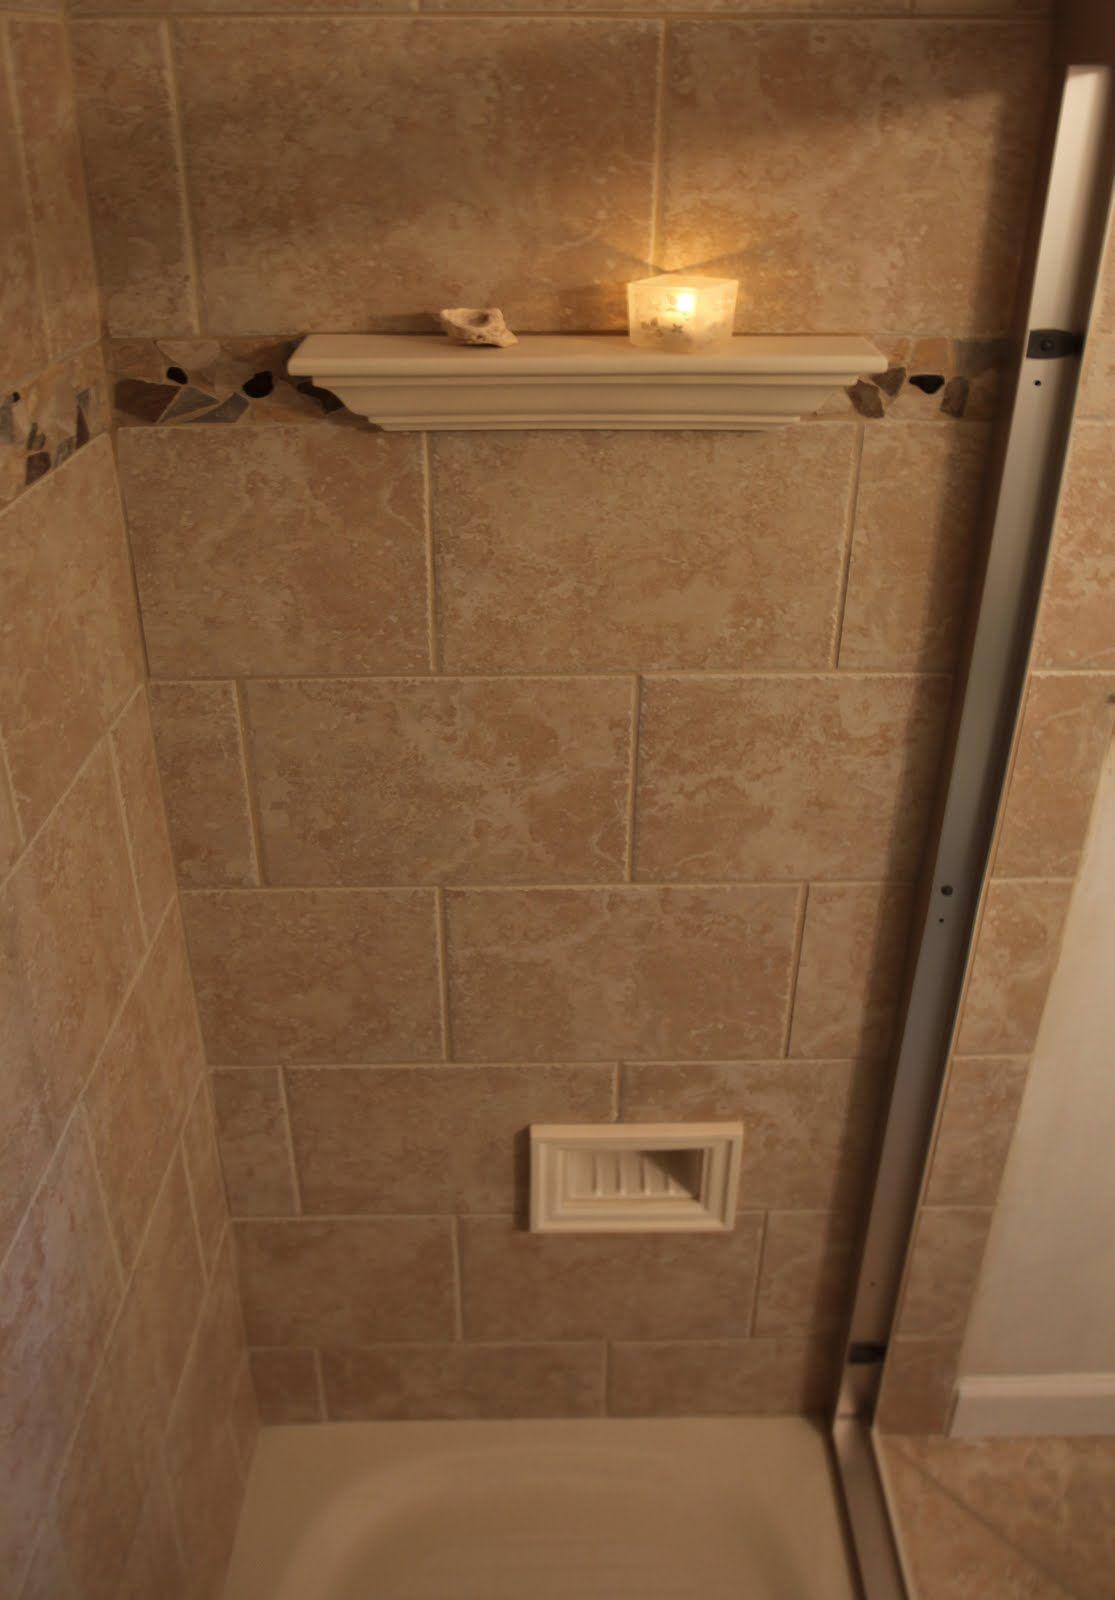 20 Functional Cool Bathroom Tile Ideas Tile Shower Niche Diy Bathroom Remodel Shower Niche